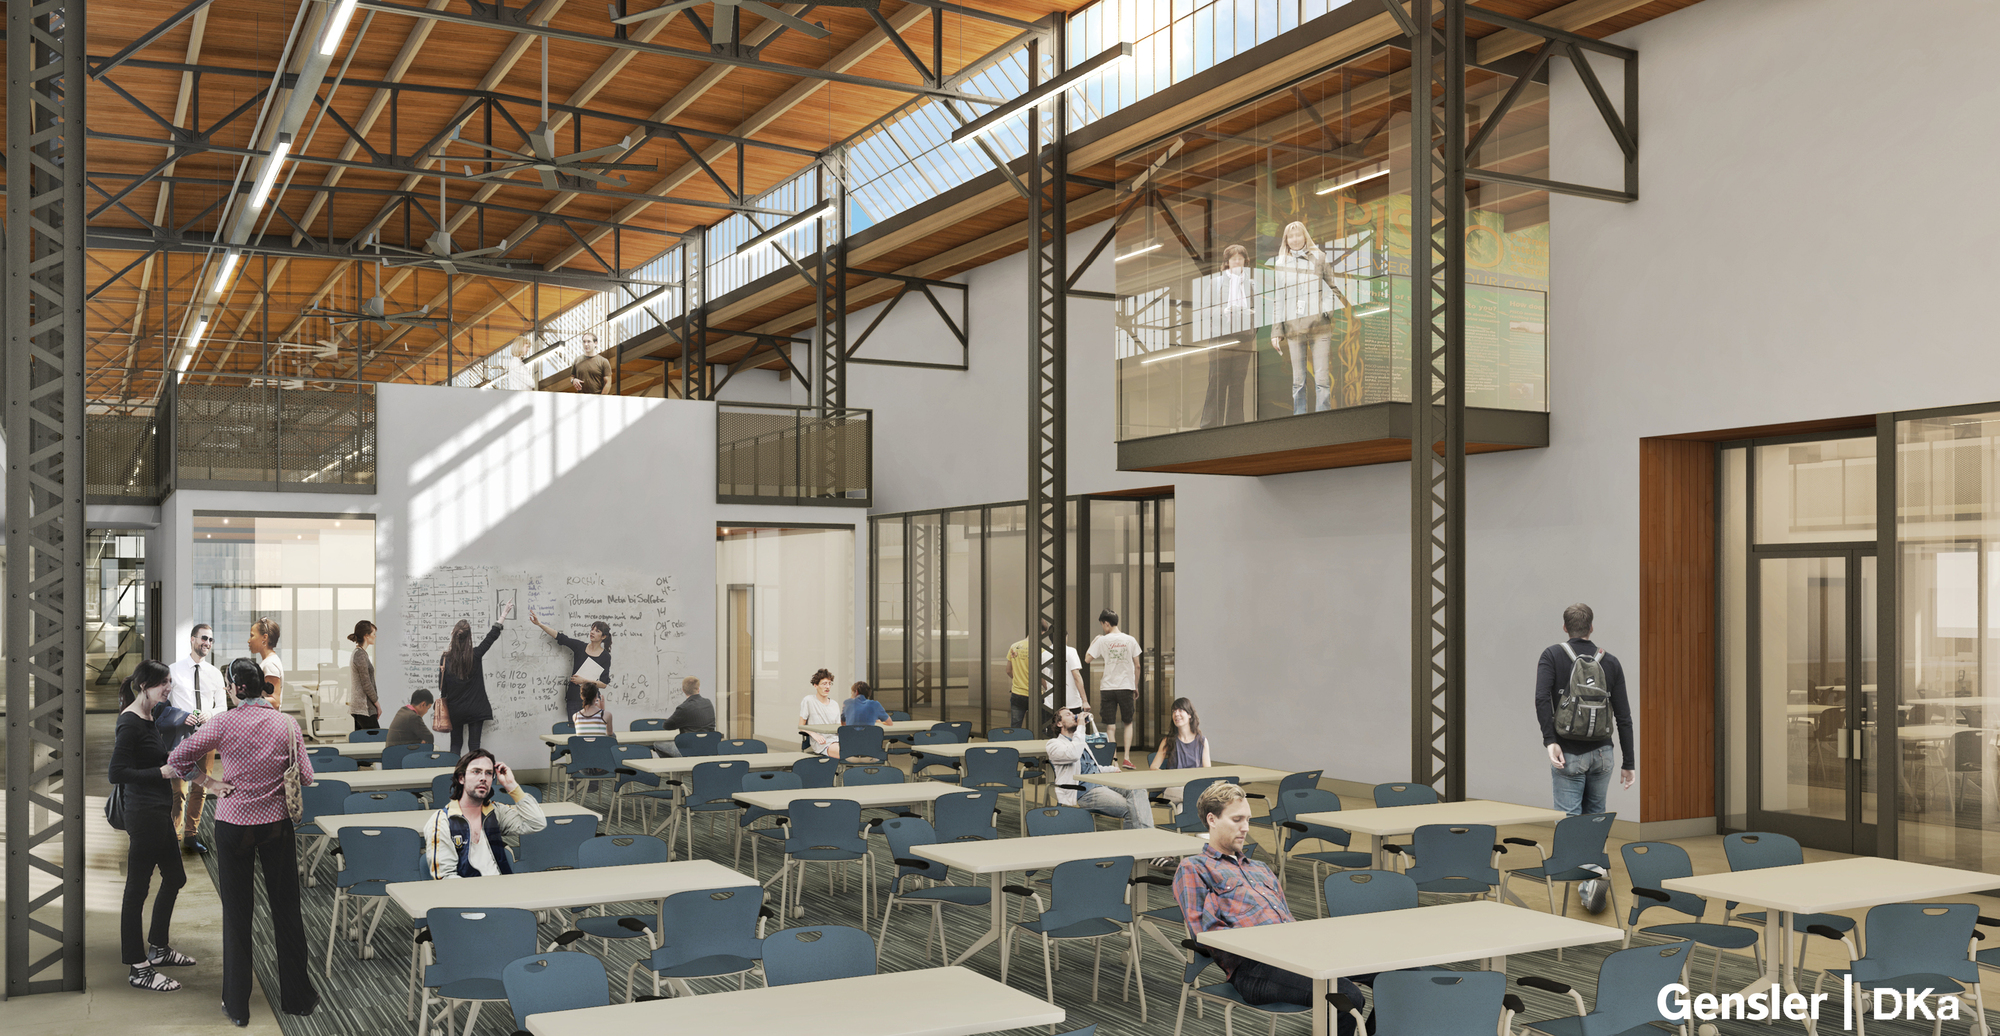 Gensler Unveils Design For AltaSea Campus At The Los Angeles Port